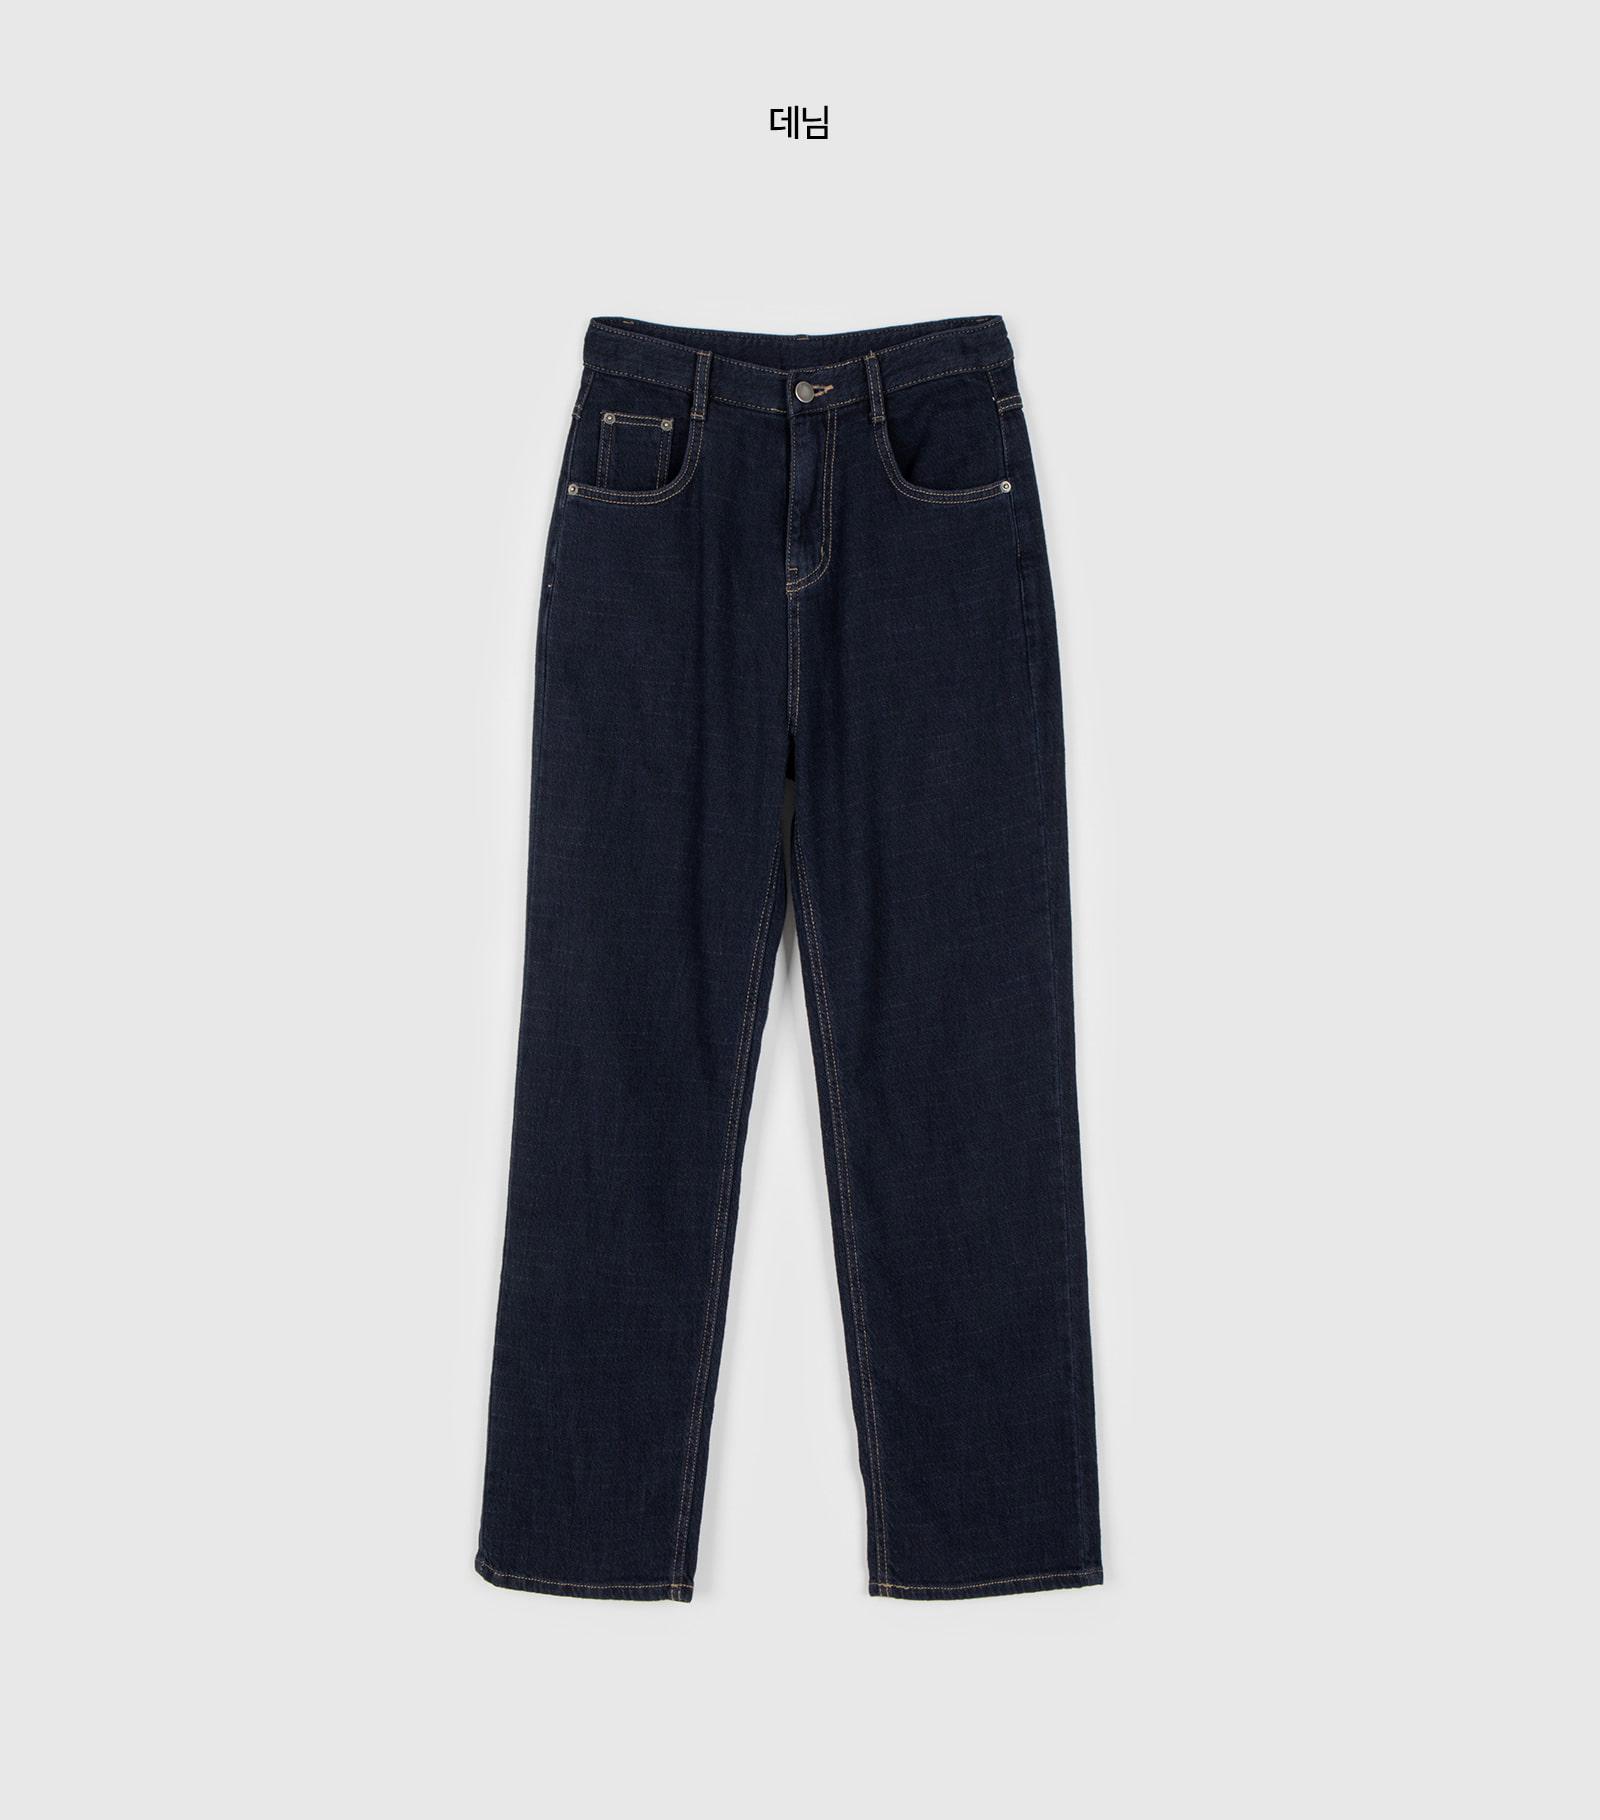 Steady dough straight jeans